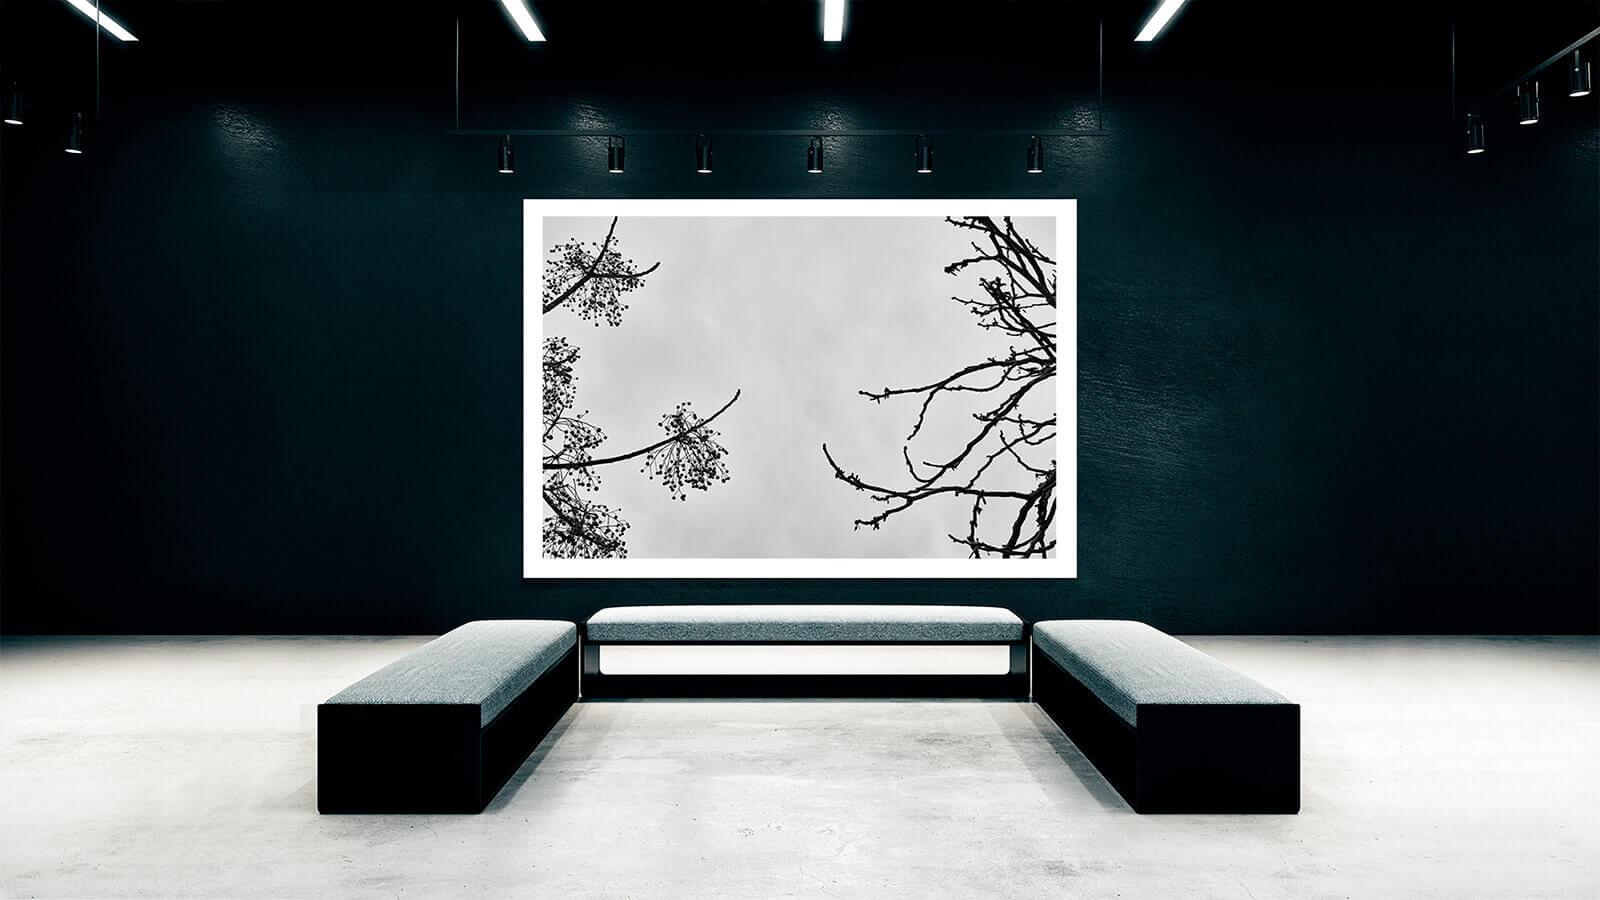 TAIYOKO-STUDIO-exposicion-Horno-Virtual-Gallery-meeting-galeria-arte-fotografia-artistica-edicion-limitada-decoracion